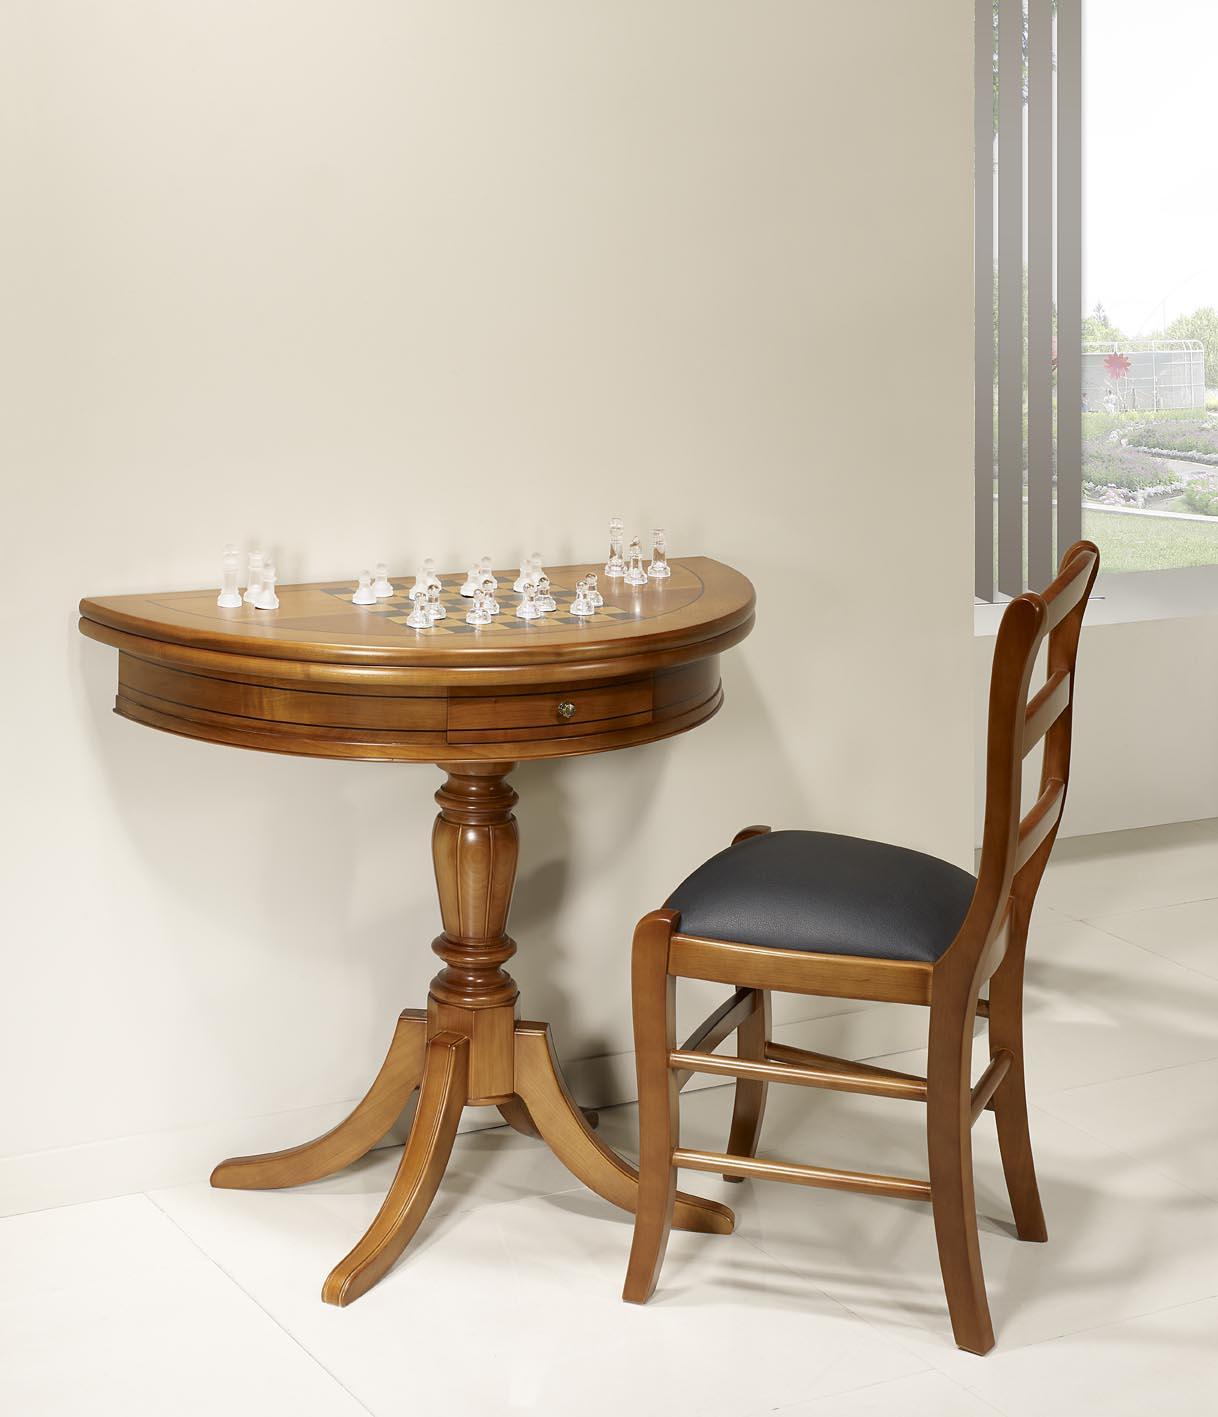 meuble demi lune great meuble with meuble demi lune poigne de meuble demi lune zamak bross. Black Bedroom Furniture Sets. Home Design Ideas